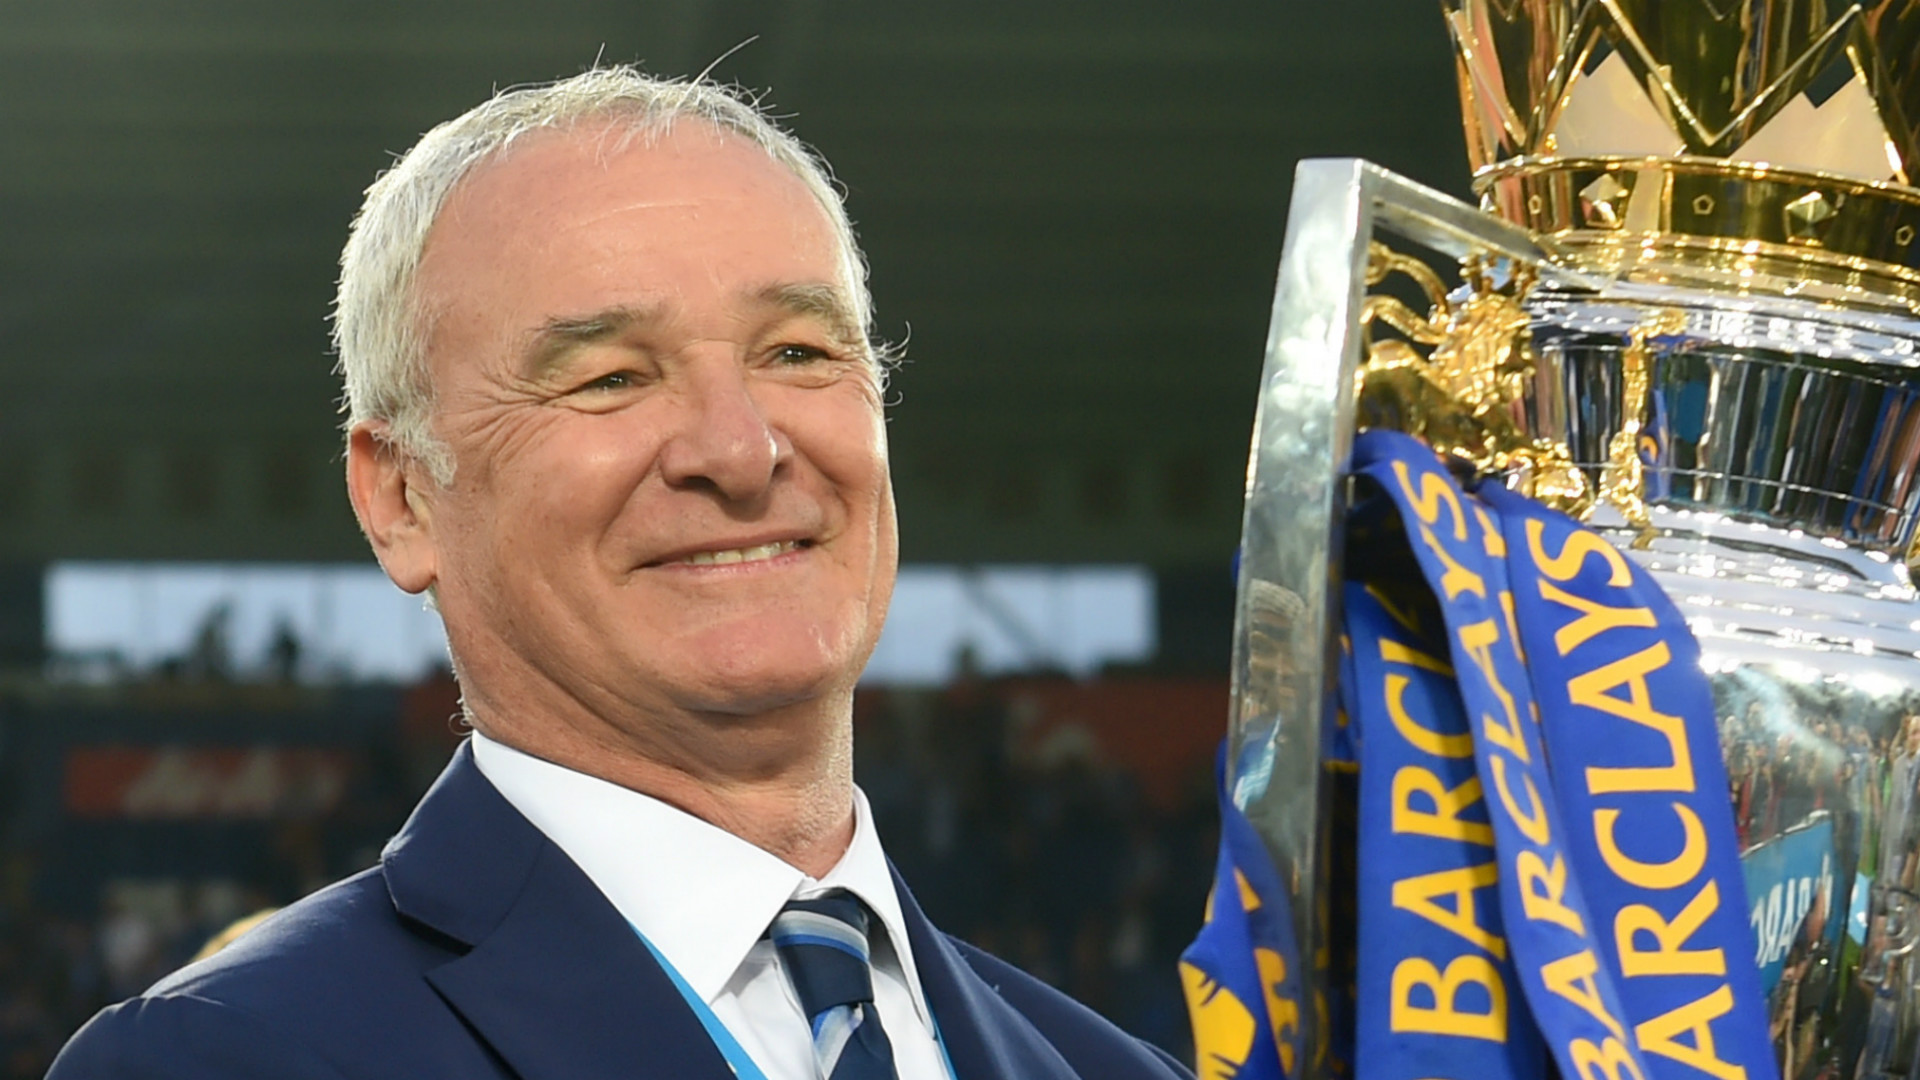 Ranieri, Santos & Zidane nominated for FIFA Coach of the Year